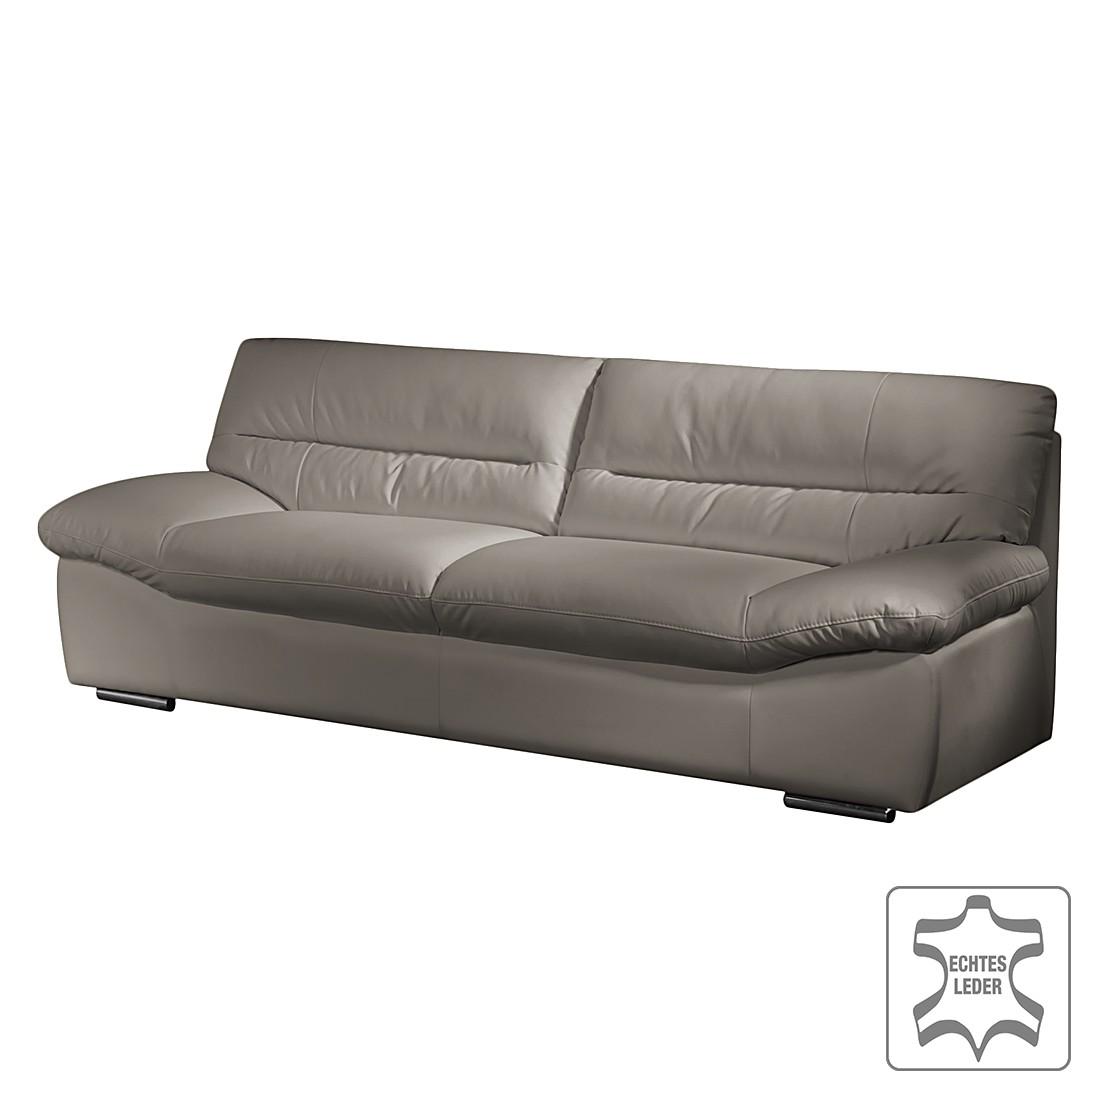 Sessel Kika Ausgezeichnet Sessel Modern Design Polstersessel